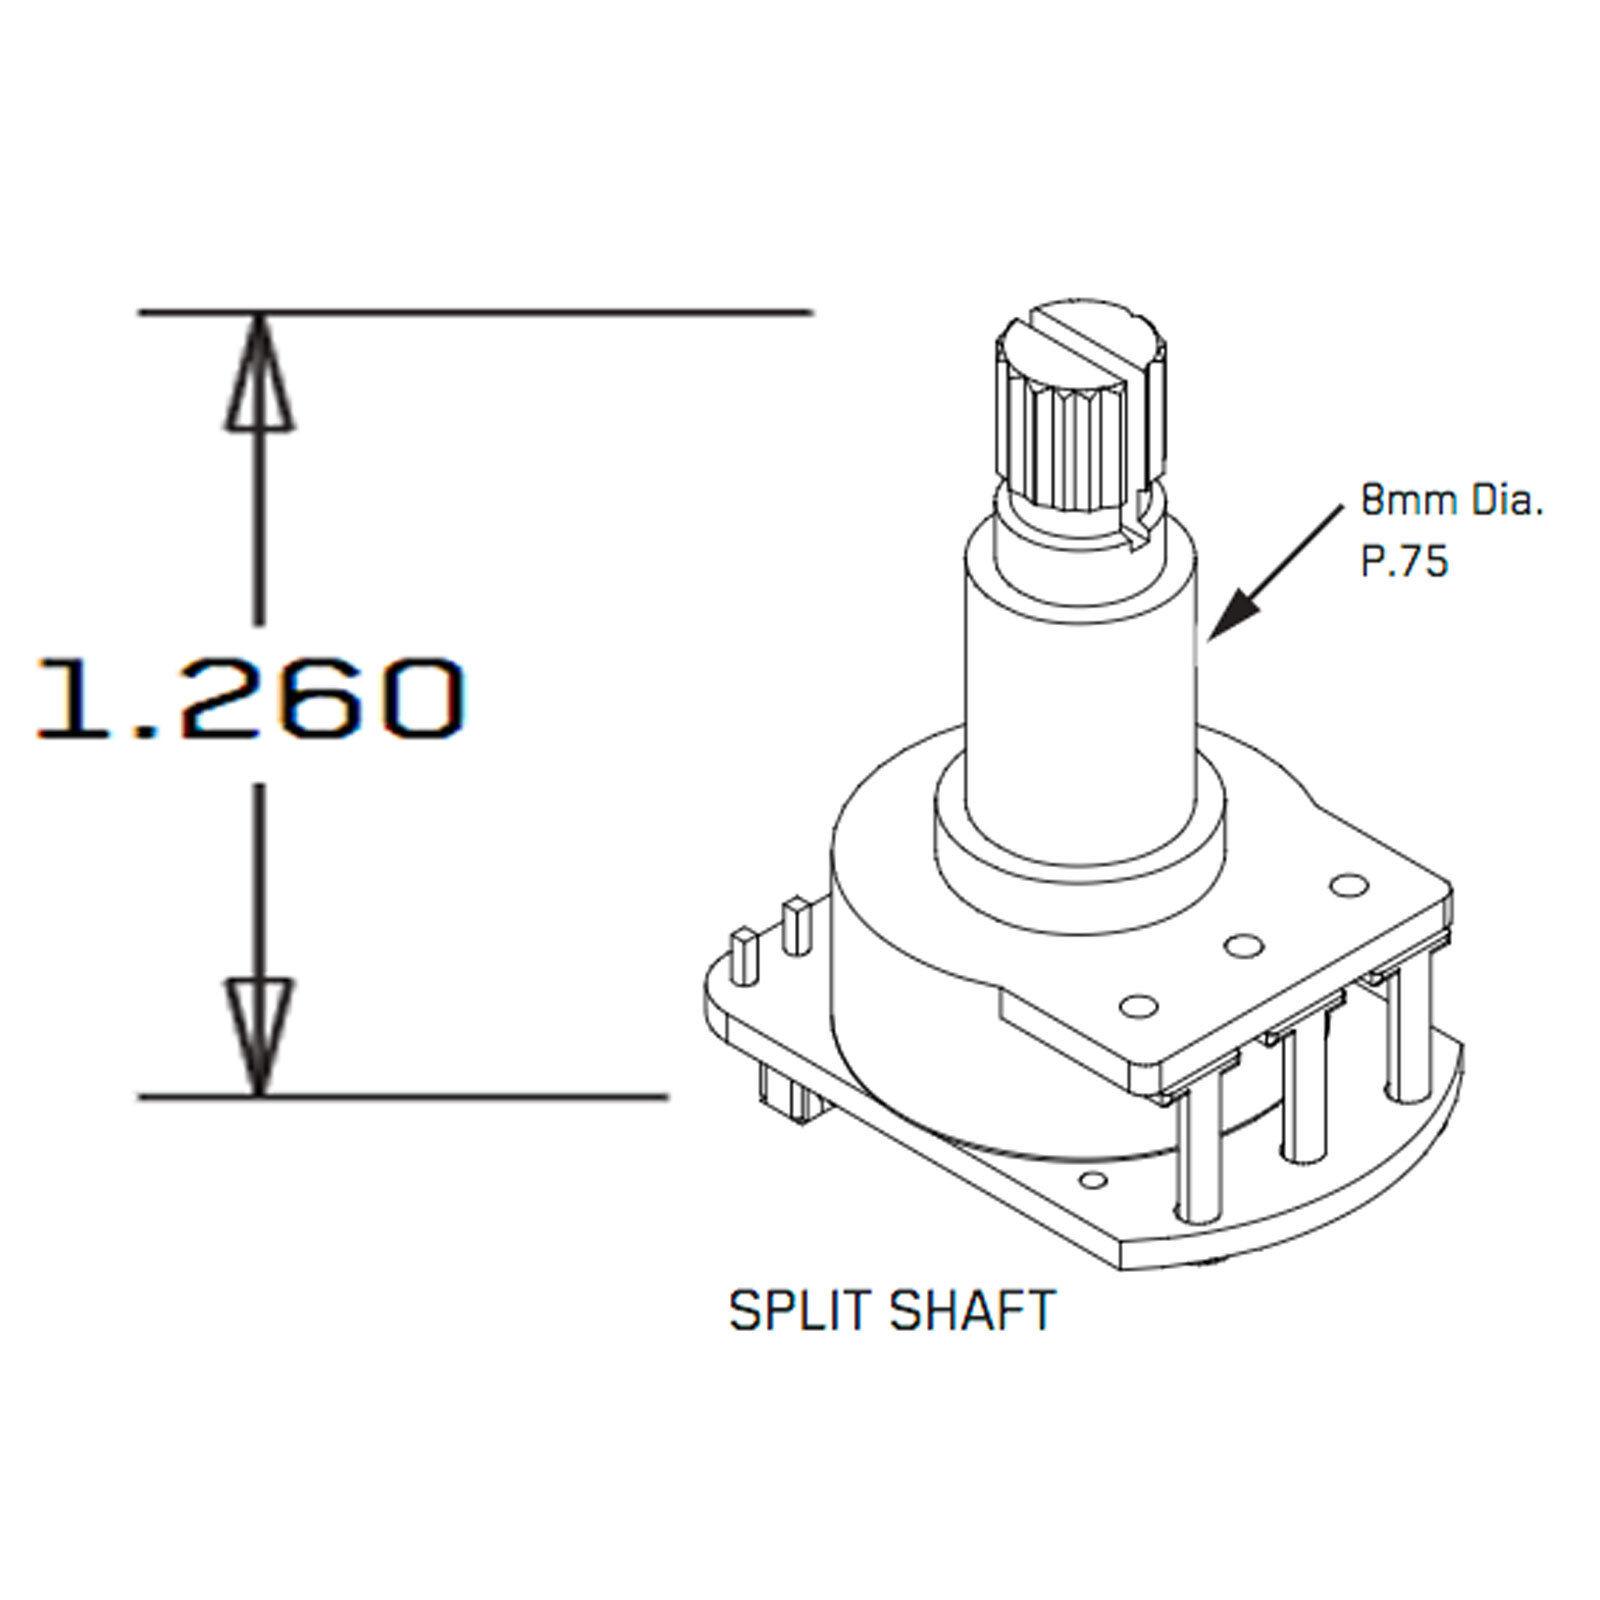 Emg Split Shaft 25k Guitar Volume Potentiometer Pot Ebay Potensio Mono 250k Norton Secured Powered By Verisign